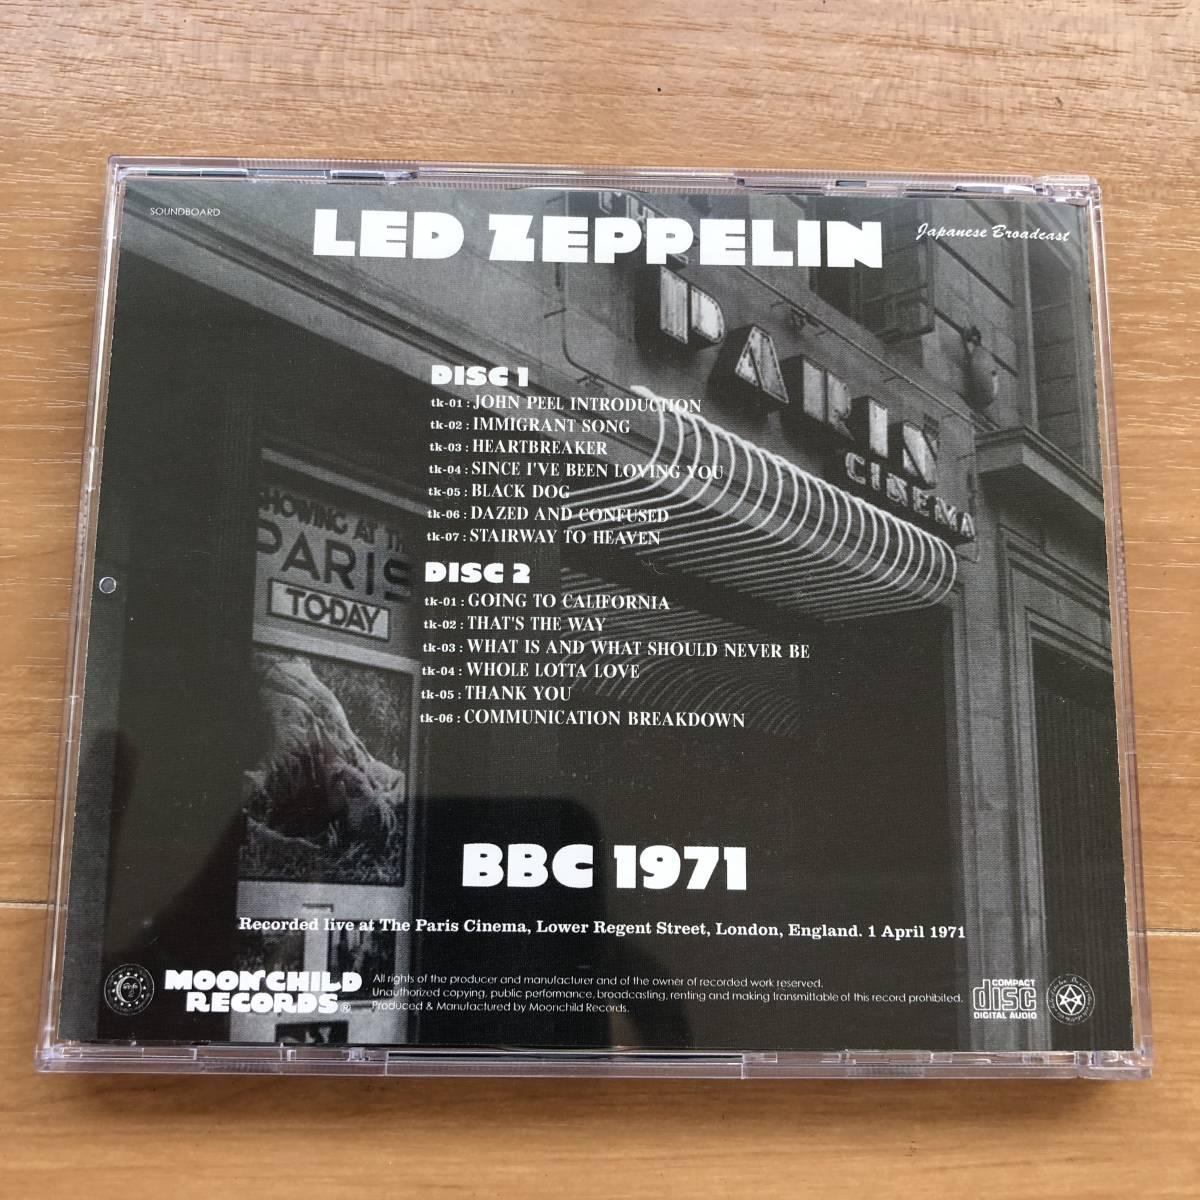 beautiful goods ]Led Zeppelin/ BBC 1971/ Winston Remaster version